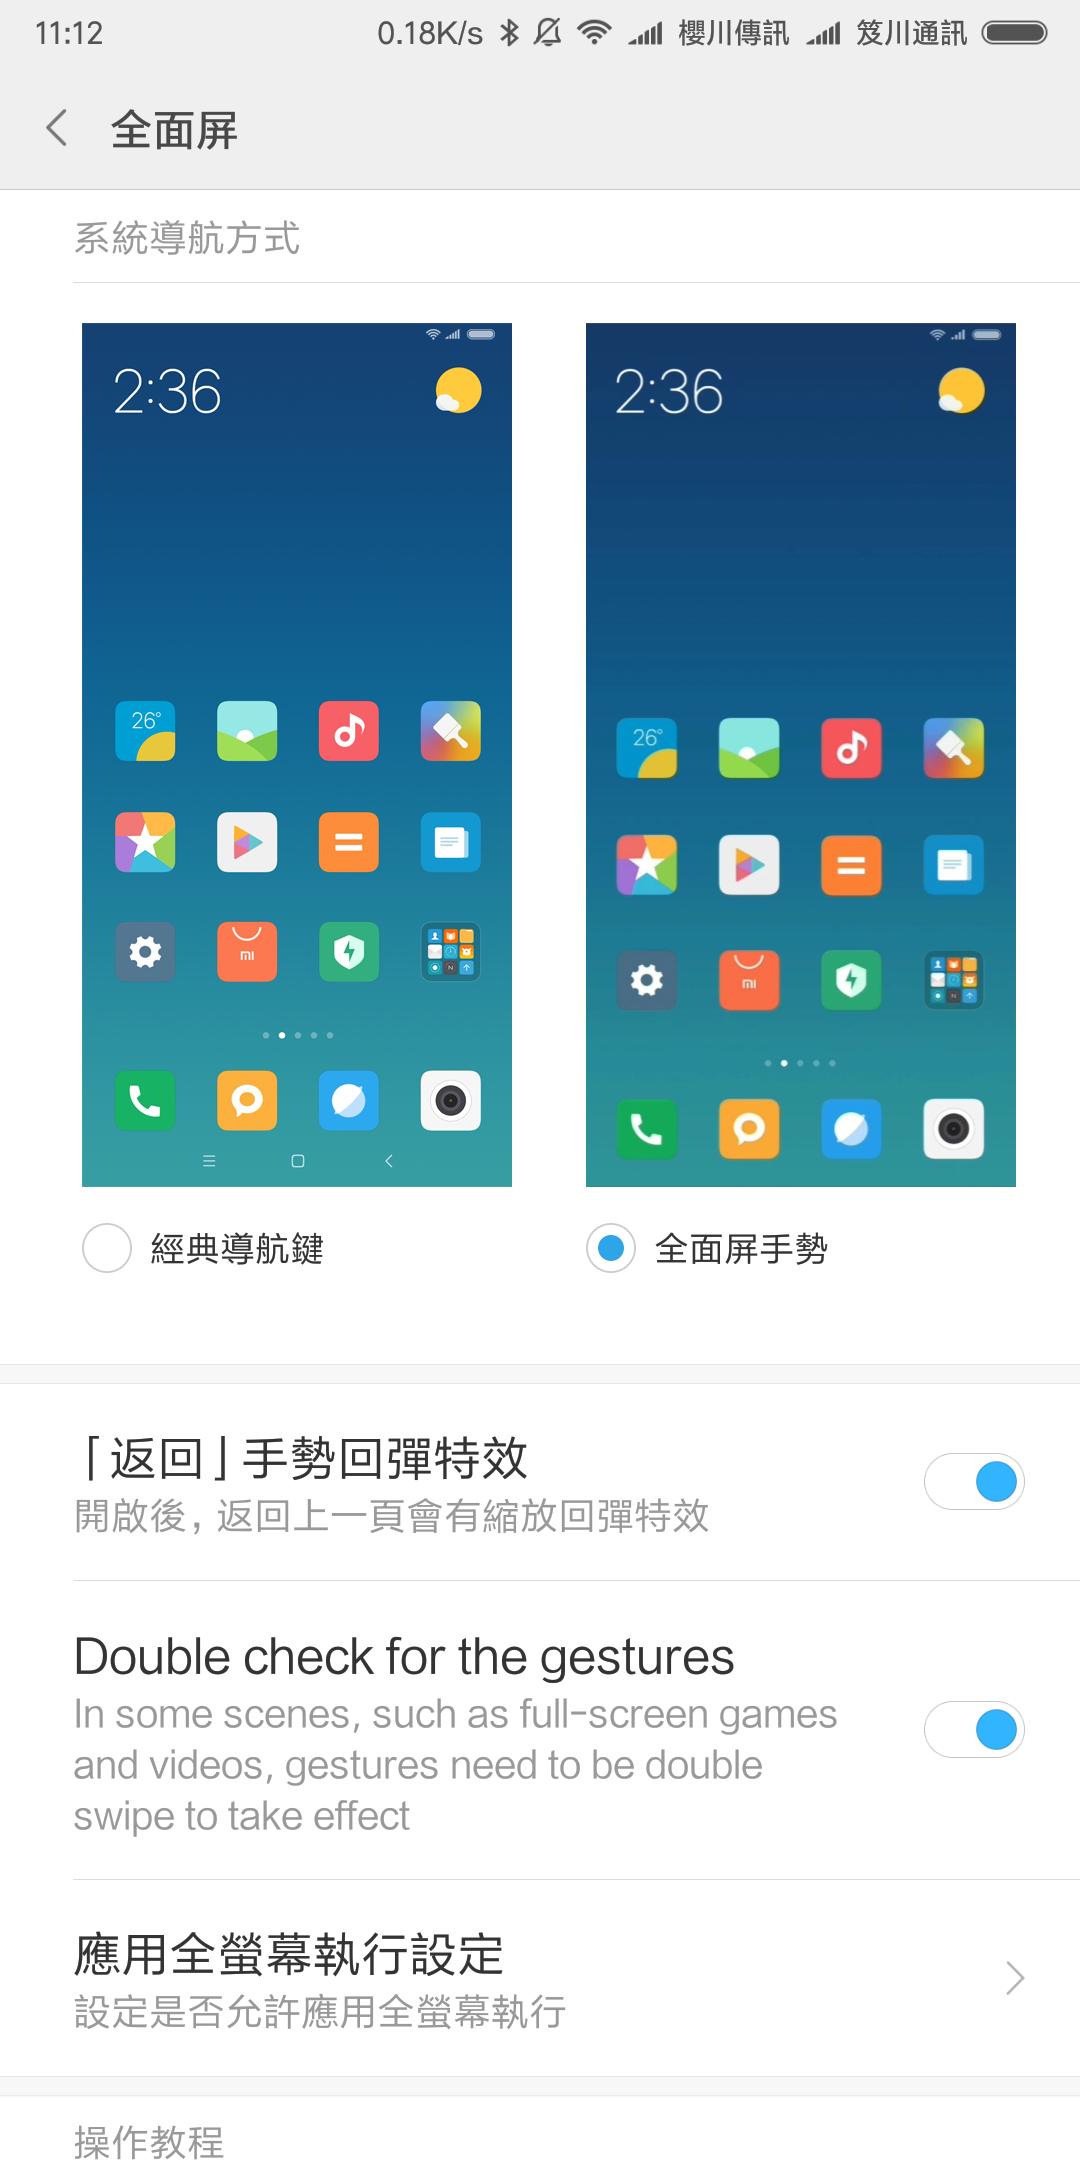 Screenshot_2018-04-13-11-12-46-088_com.android.settings